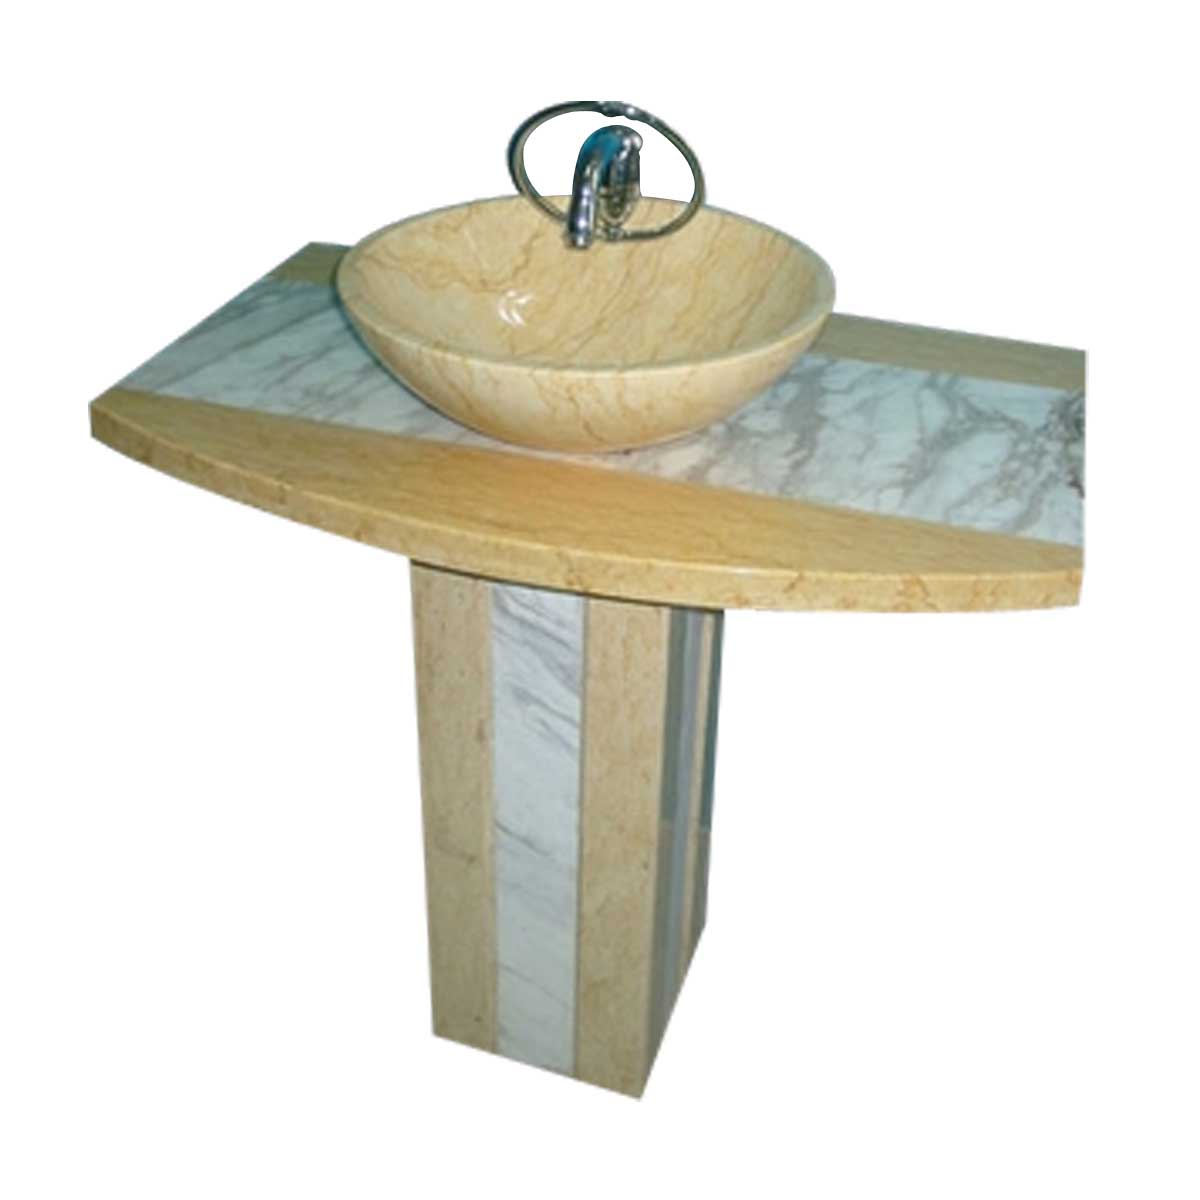 Carved Stone Sink : Marble Beige/Multi Marble Hand Carved Marble Pedestal Sink